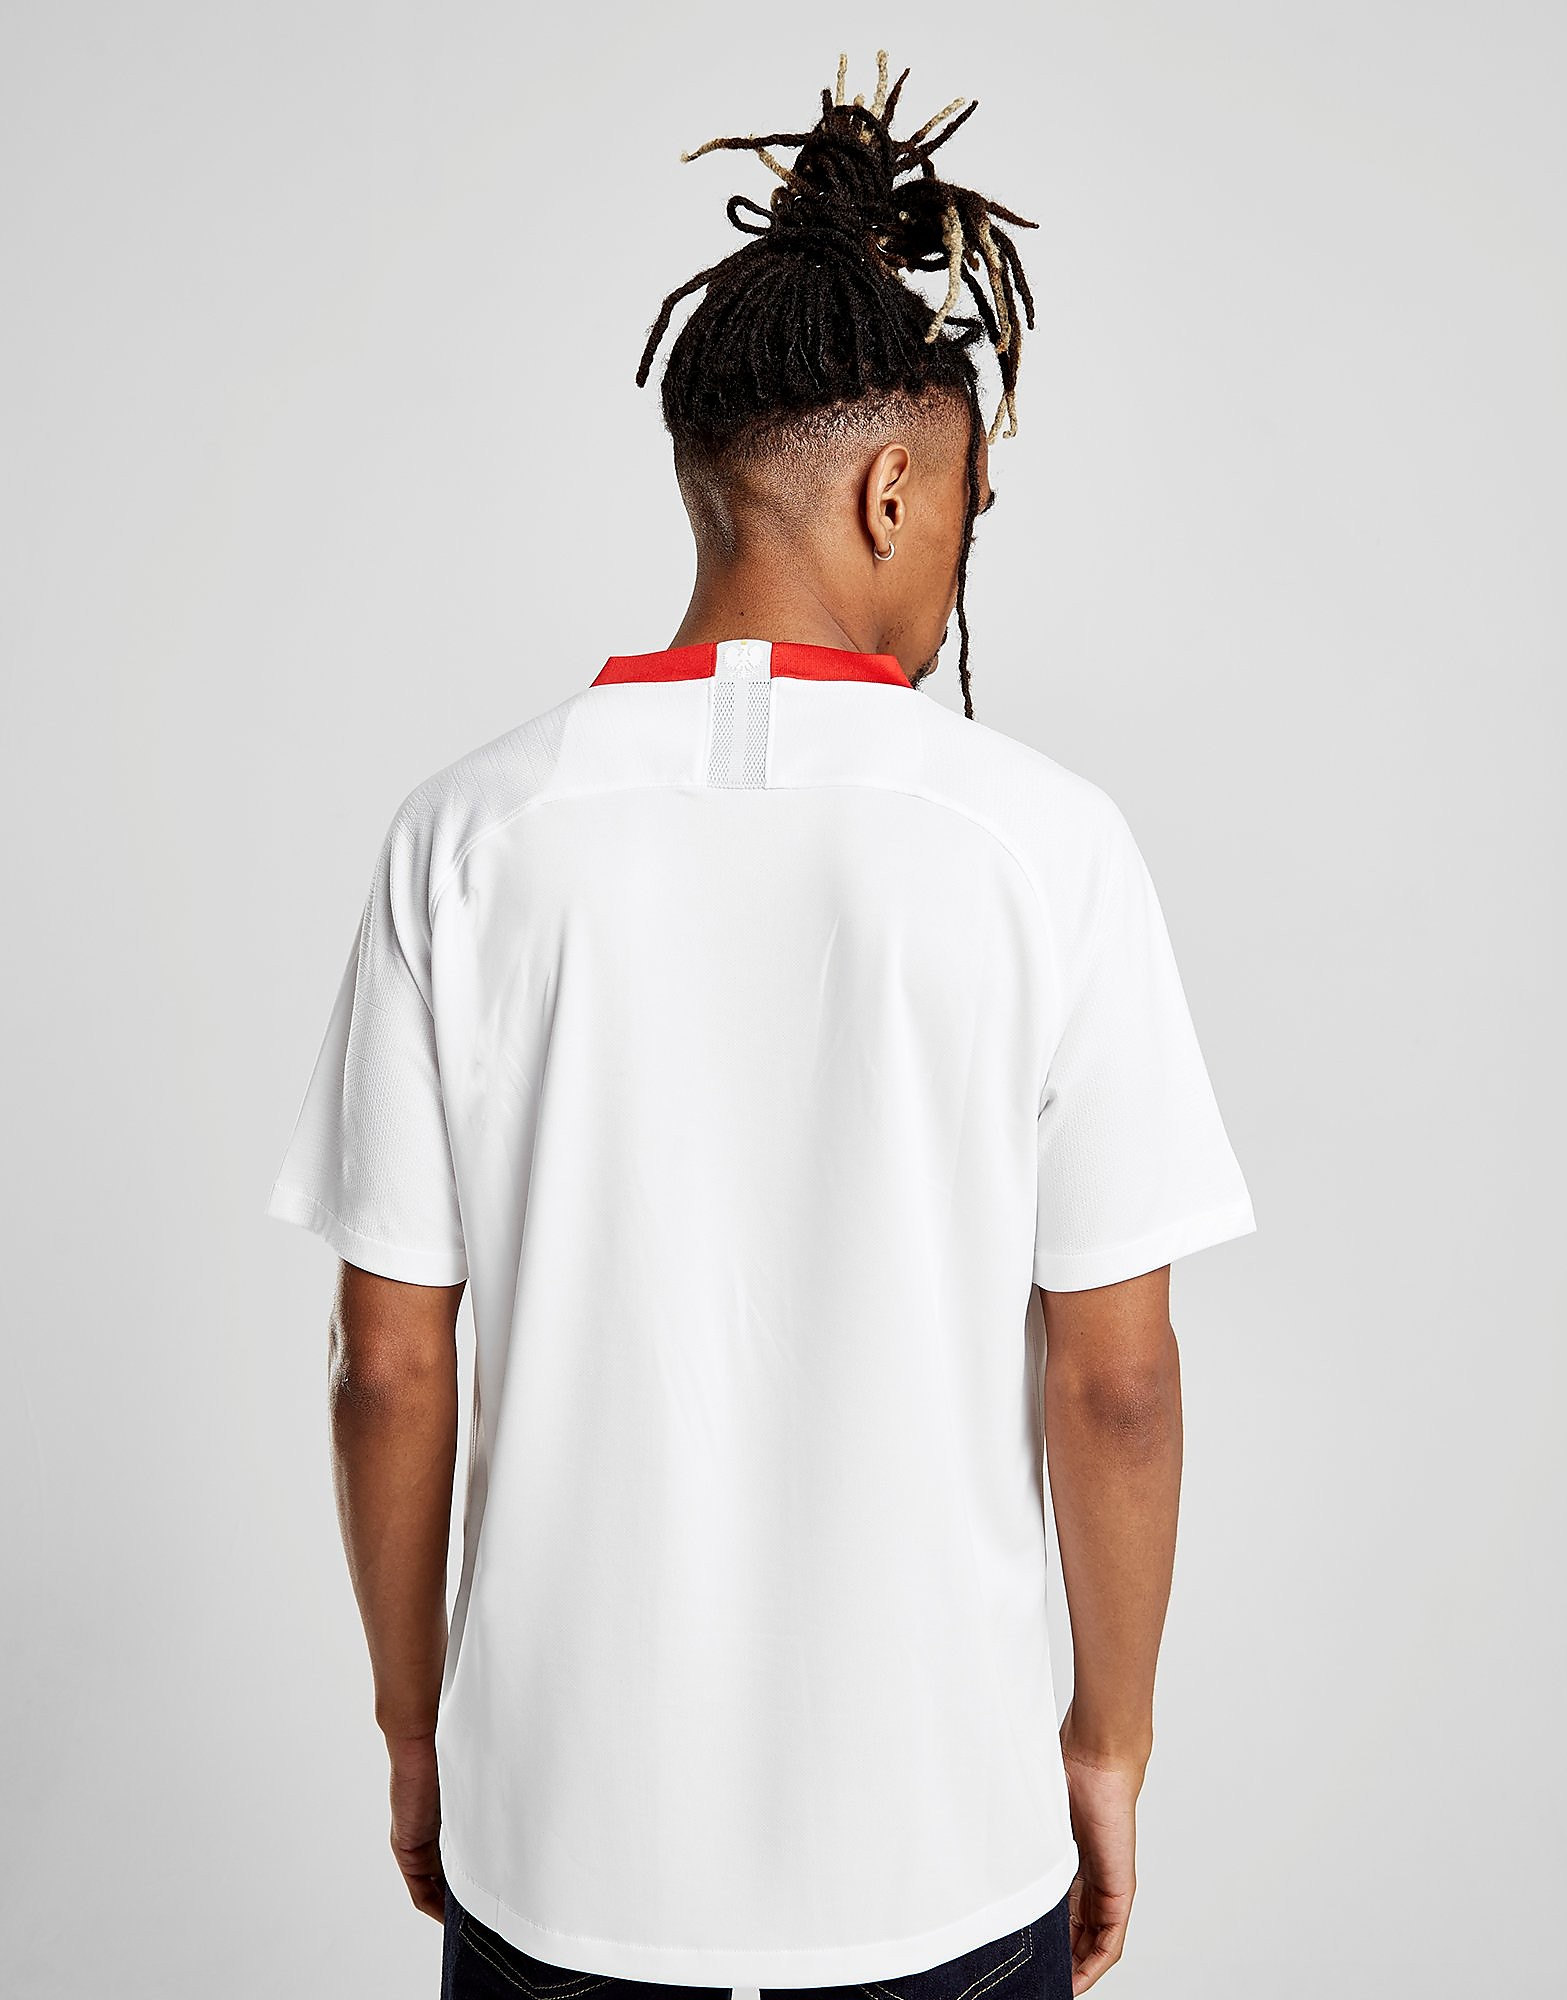 Nike Maillot Domicile Pologne 2018 Homme